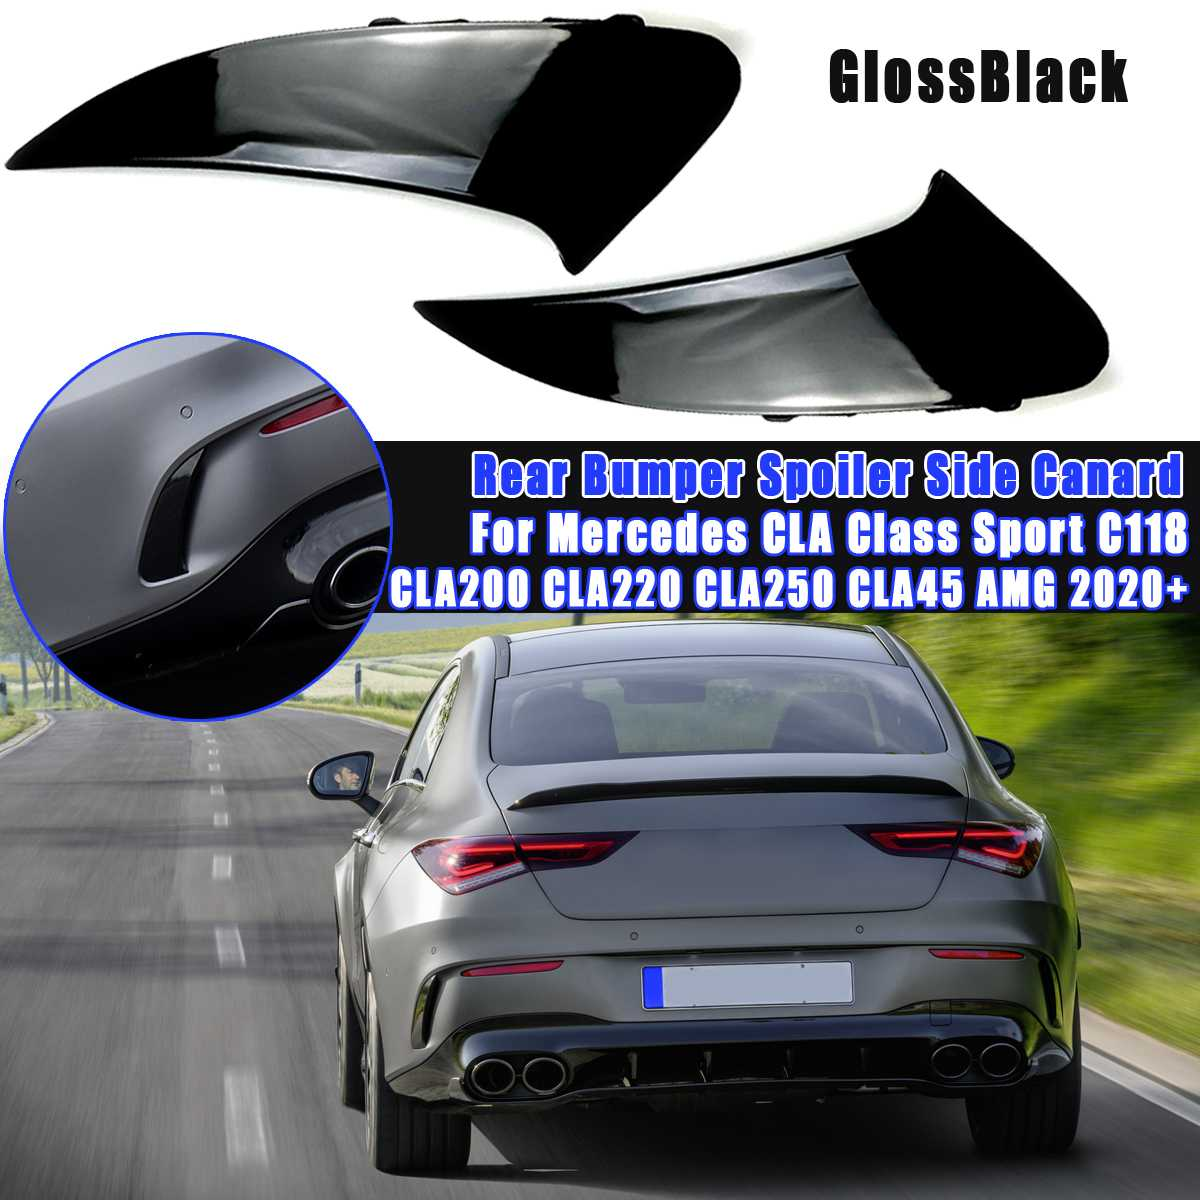 Right Hand Drive For CLA GLA A Class C117 W176 W177 X156 A180 2012-2019 ABS Car Cup Holder Cover Trim Carbon Fiber Style